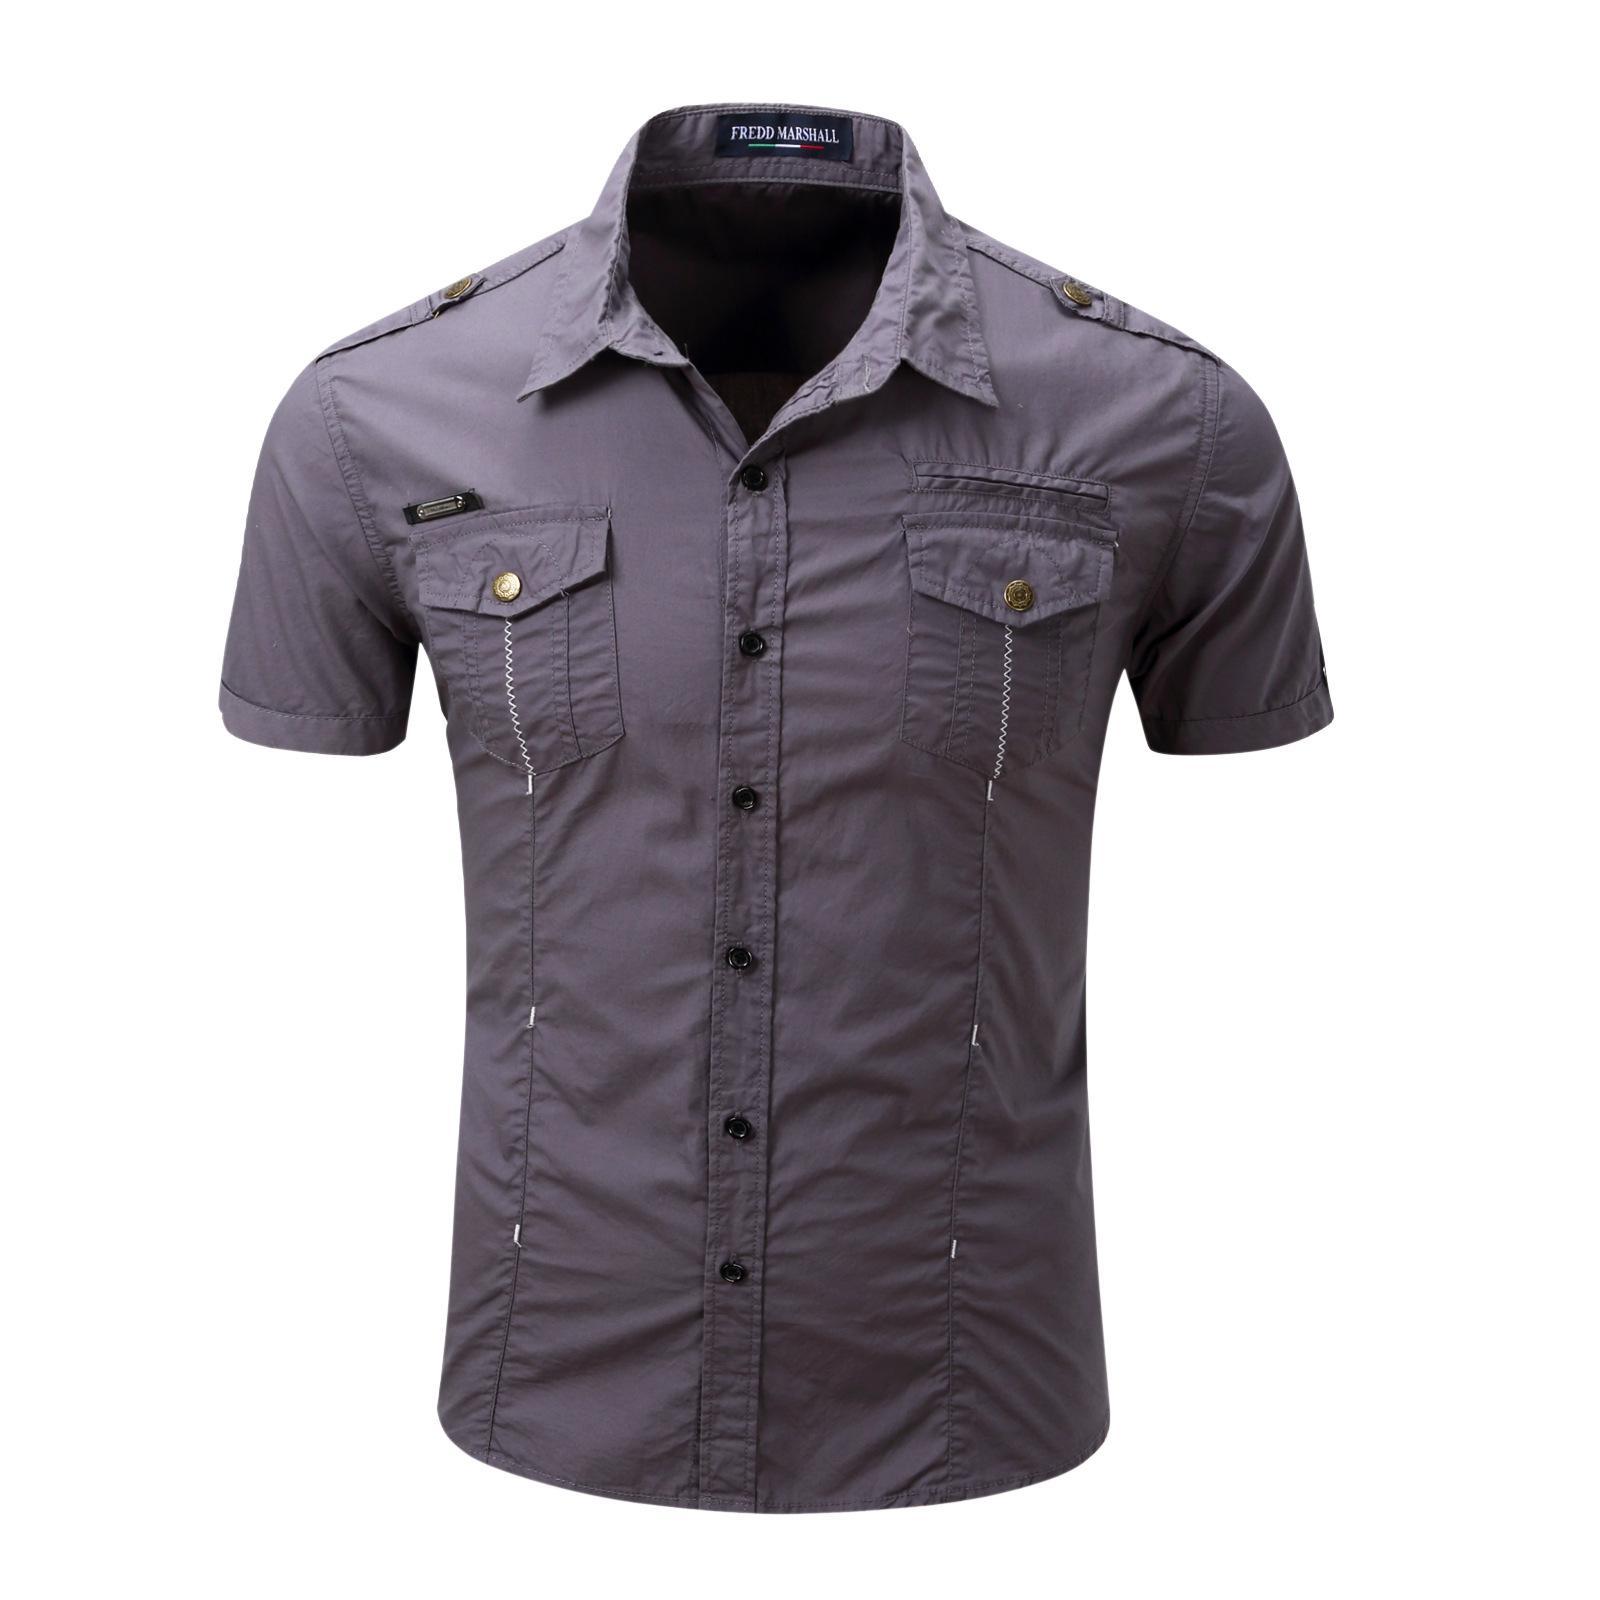 e46b1bb429 2019 2018 Summer Men Shirt Dress Camisa Social Masculina Brand Clothing Men  Shirts Slim Fit Short Sleeves Blouses Outdoor Military Shirt From  Qingchunxu